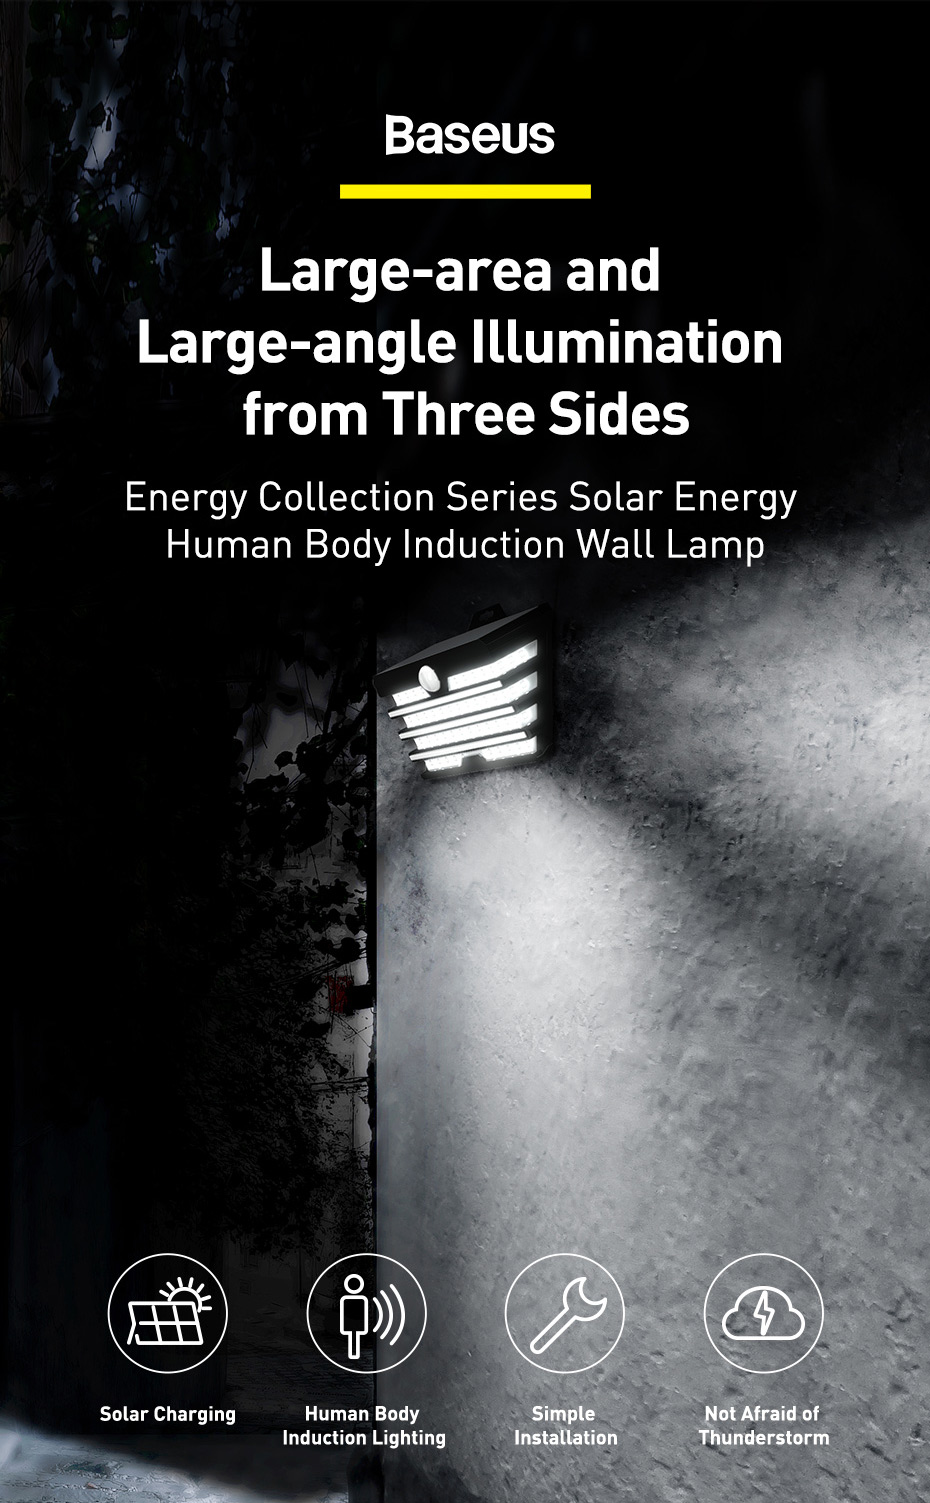 BASEUS ENERGY SOLAR LED LIGHT OUTDOOR WALL LAMP 5